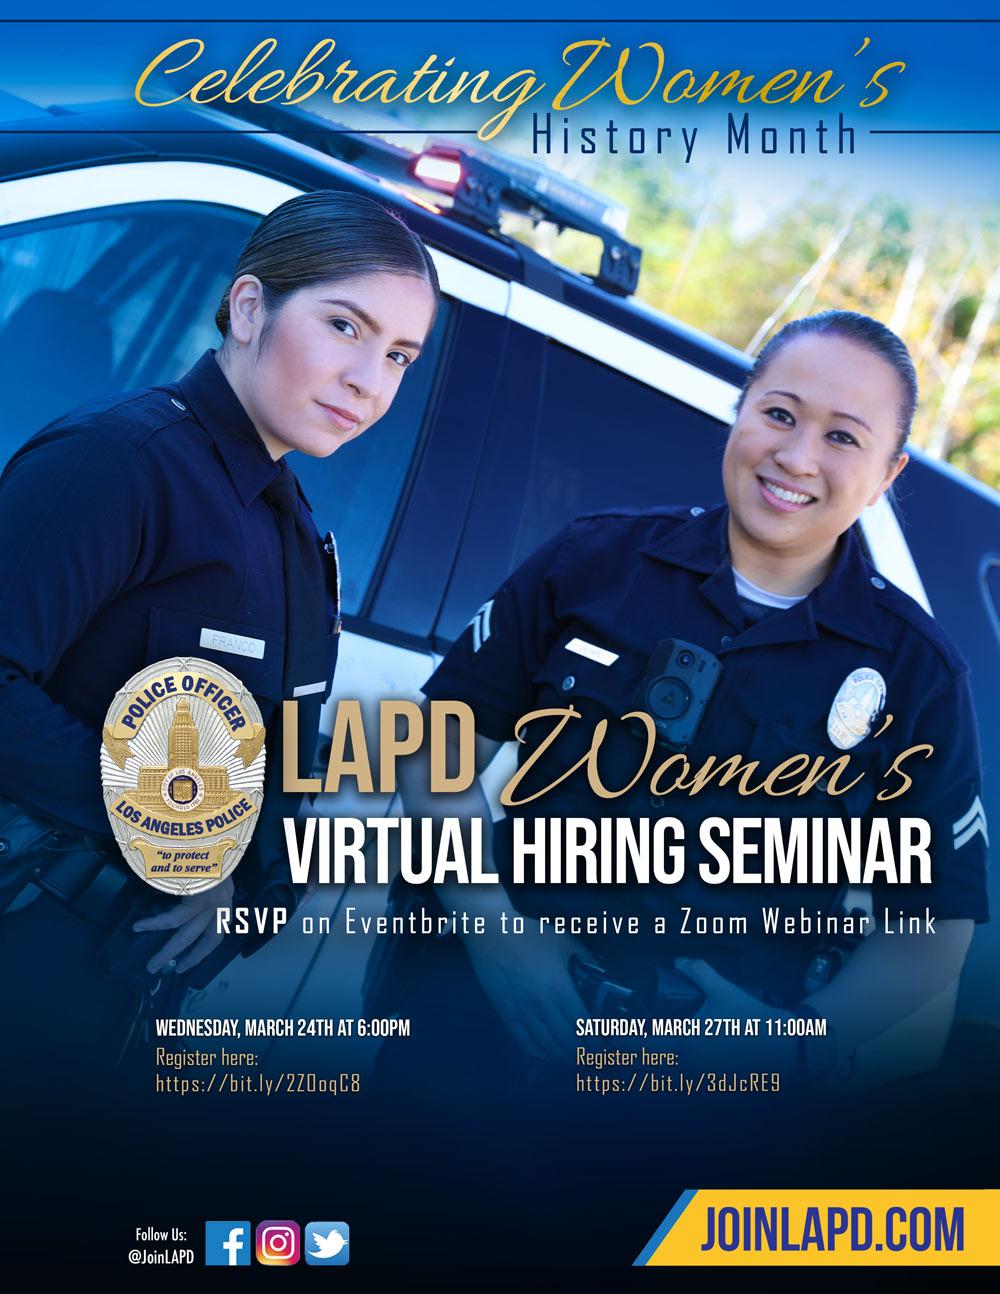 LAPD Virtual Hiring Seminar